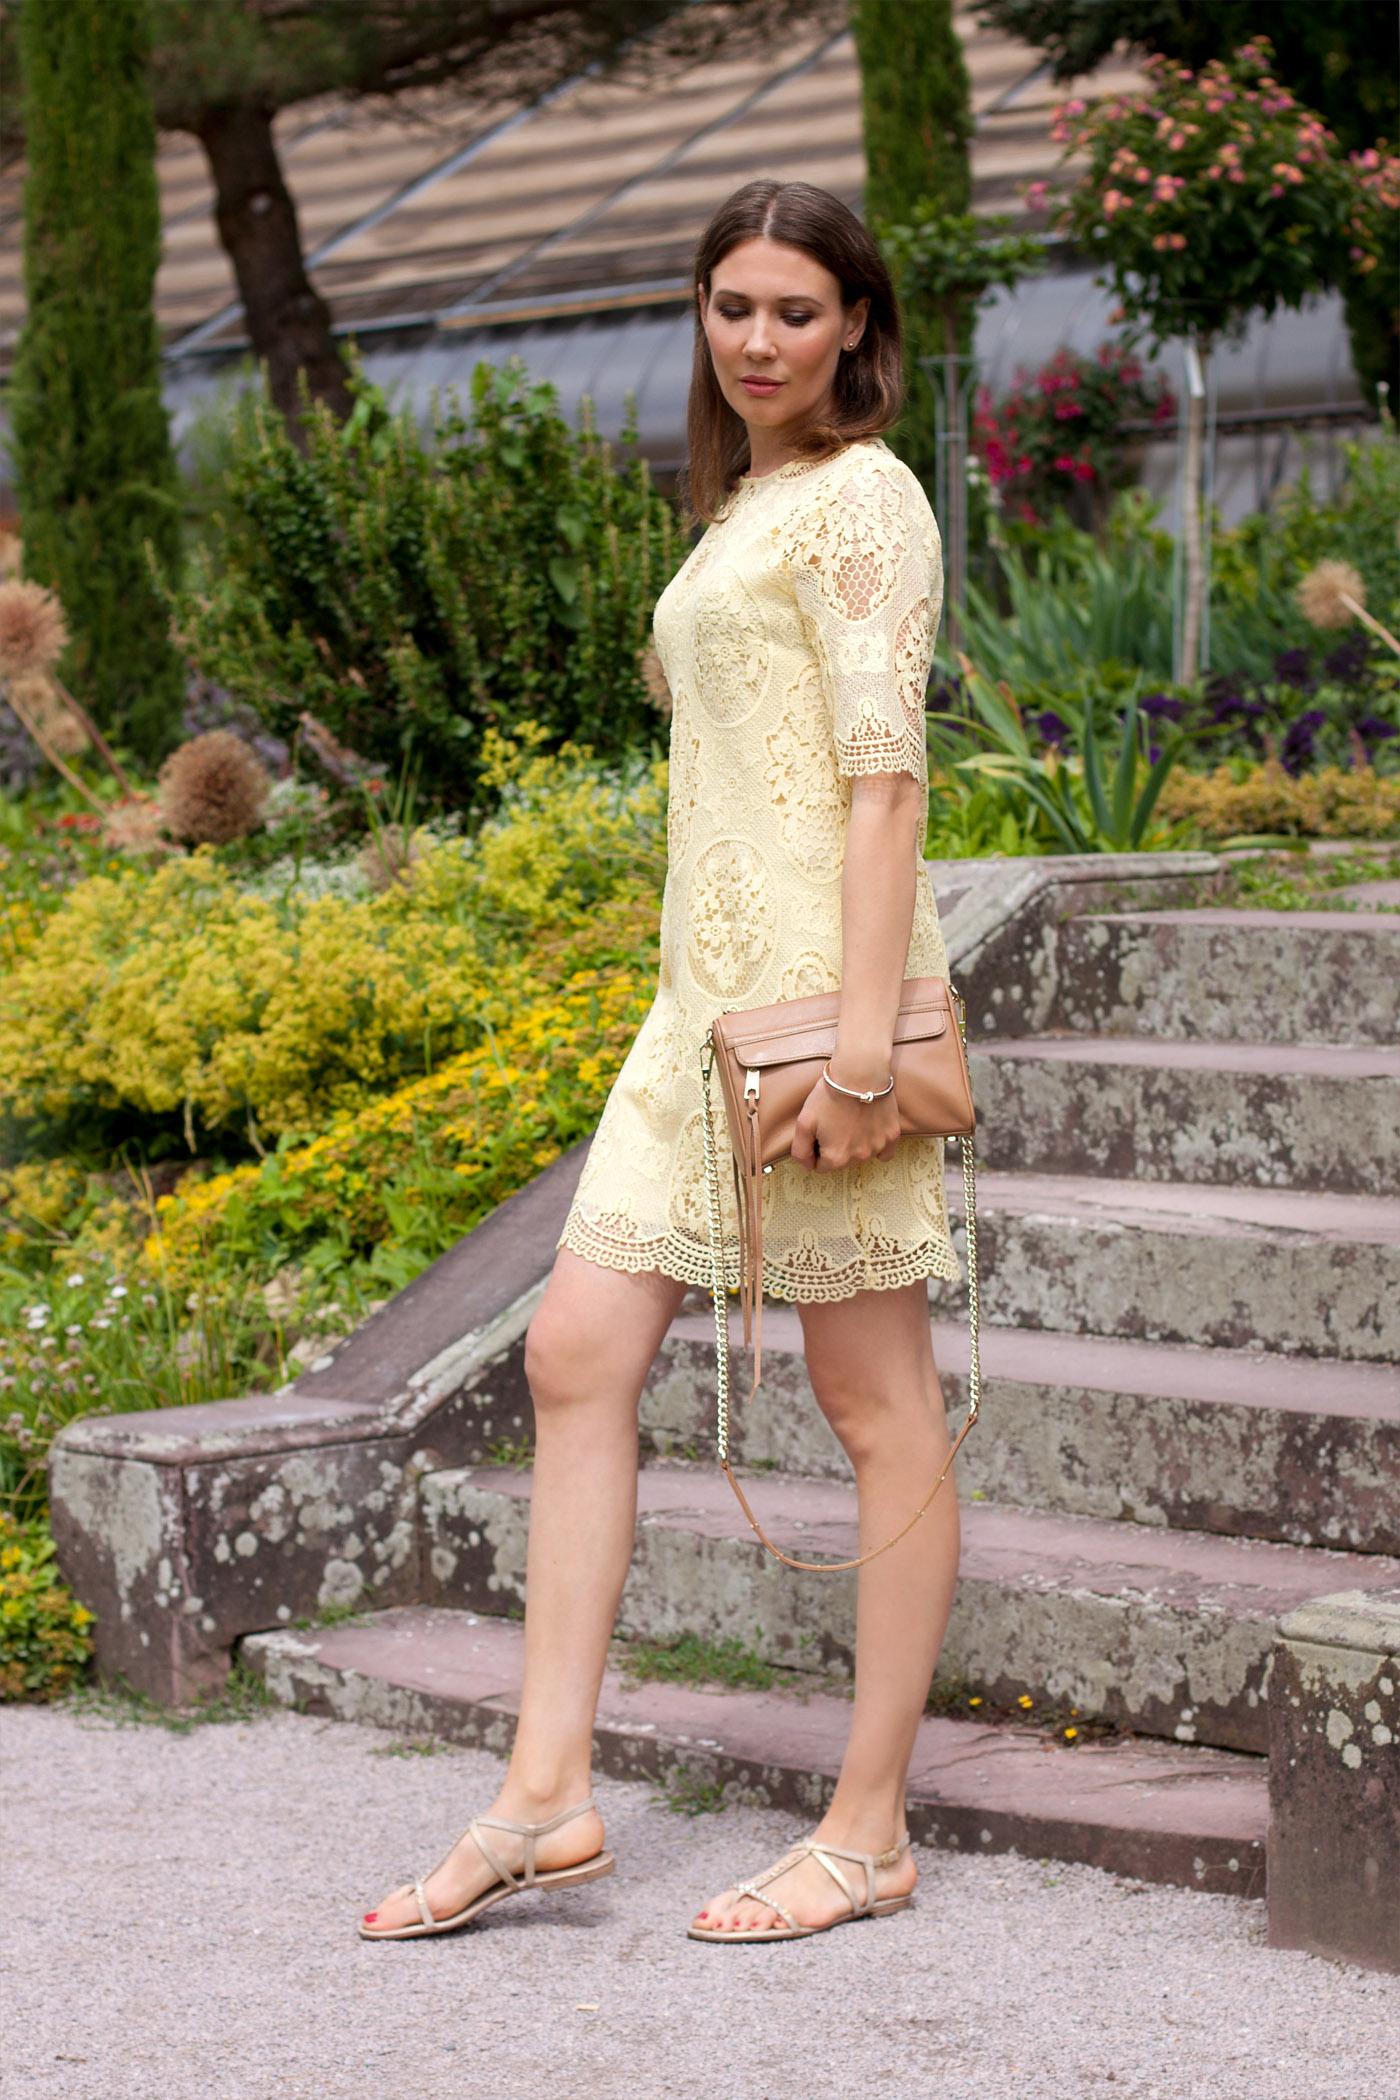 vanilla zara dress 01 mood for style fashion food beauty lifestyleblog. Black Bedroom Furniture Sets. Home Design Ideas